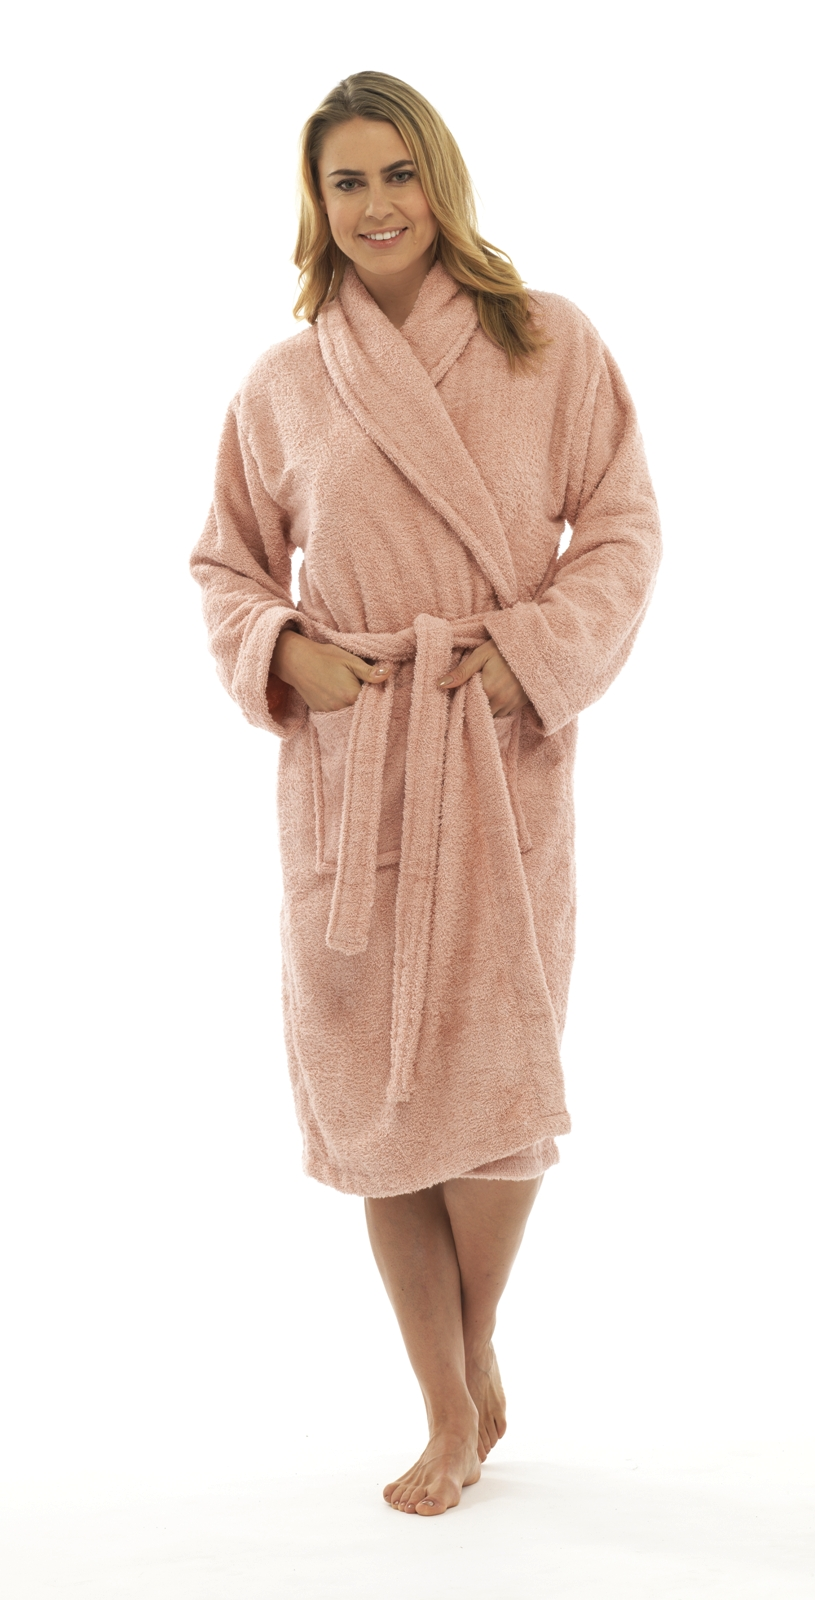 bademantel damen baumwolle damen bademantel sauna morgenmantel baumwolle mode bademantel kurz. Black Bedroom Furniture Sets. Home Design Ideas